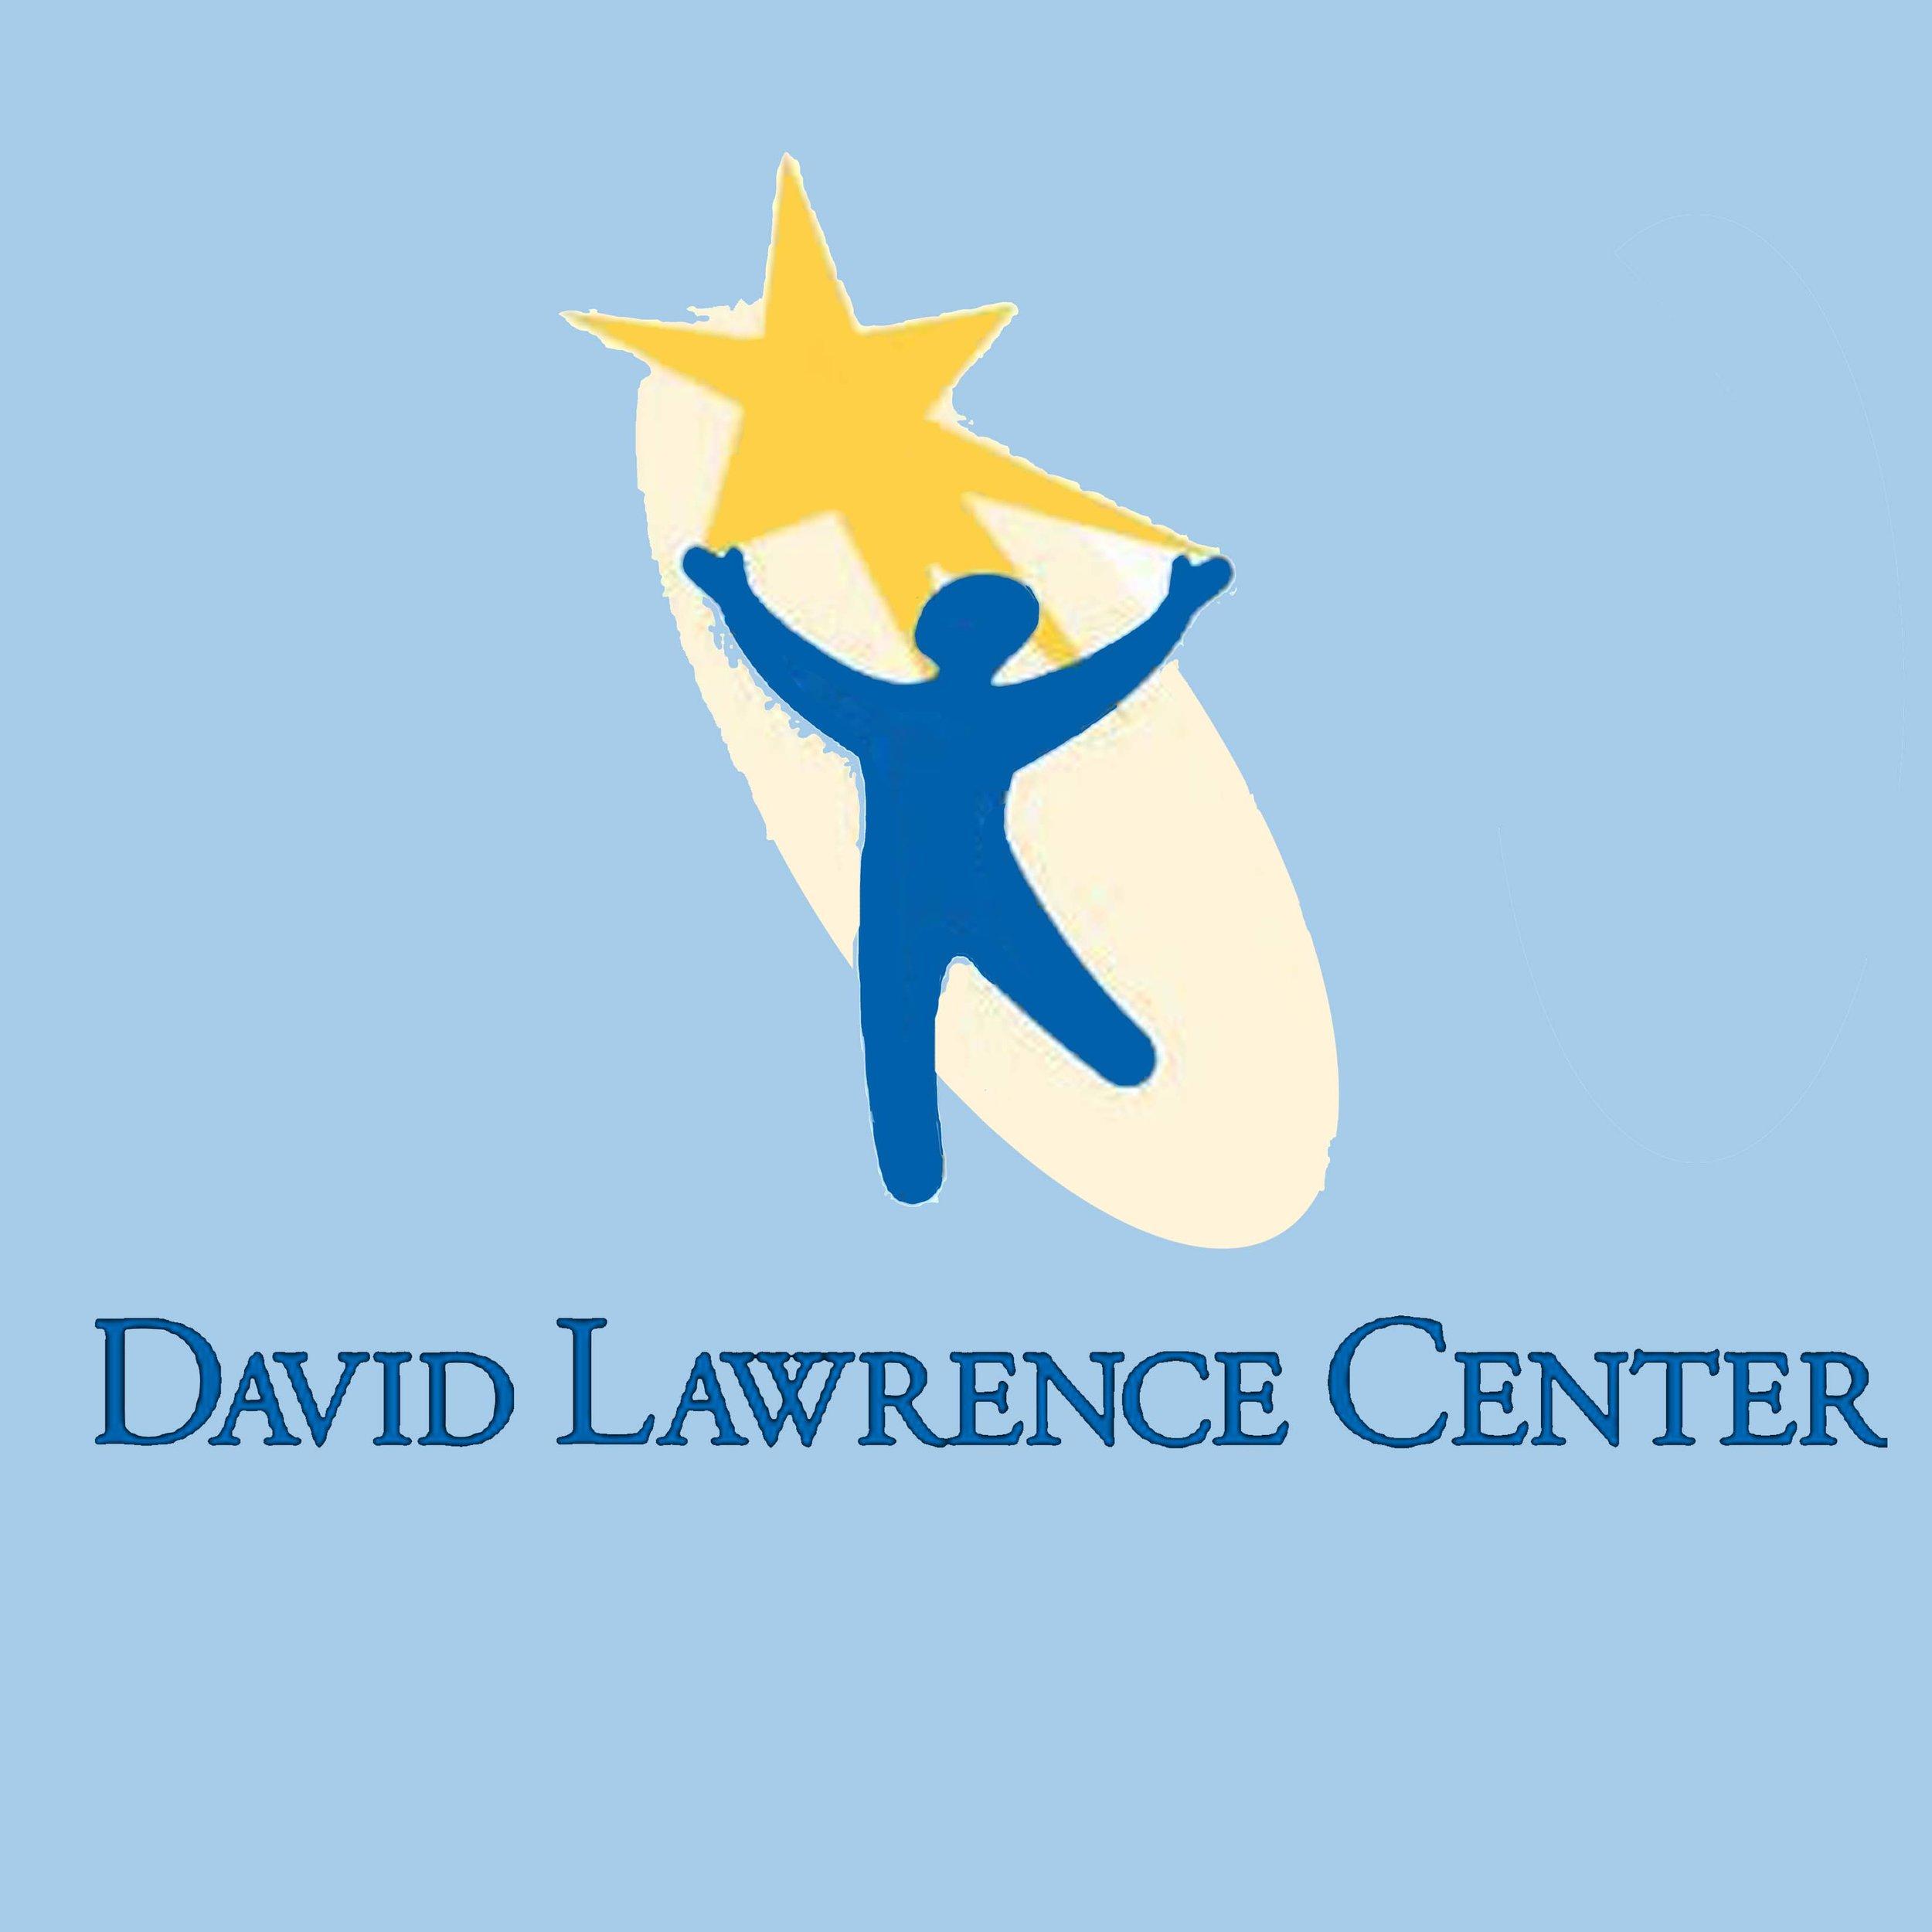 david lawrence center.jpg